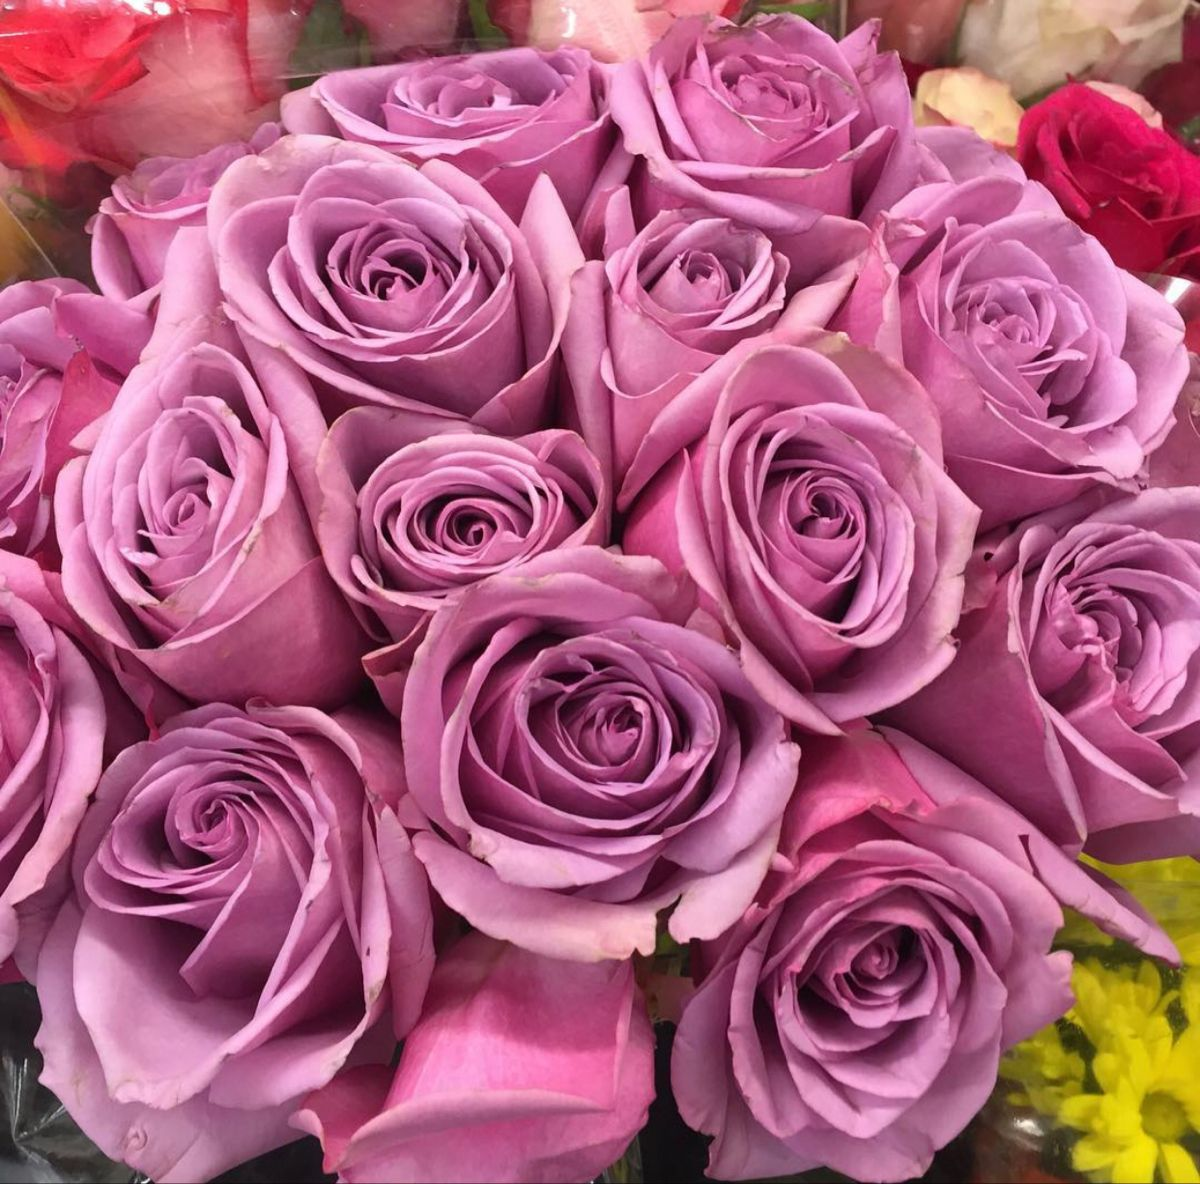 Lavender Roses In 2020 Bulk Flowers Online Wholesale Flowers Ordering Roses